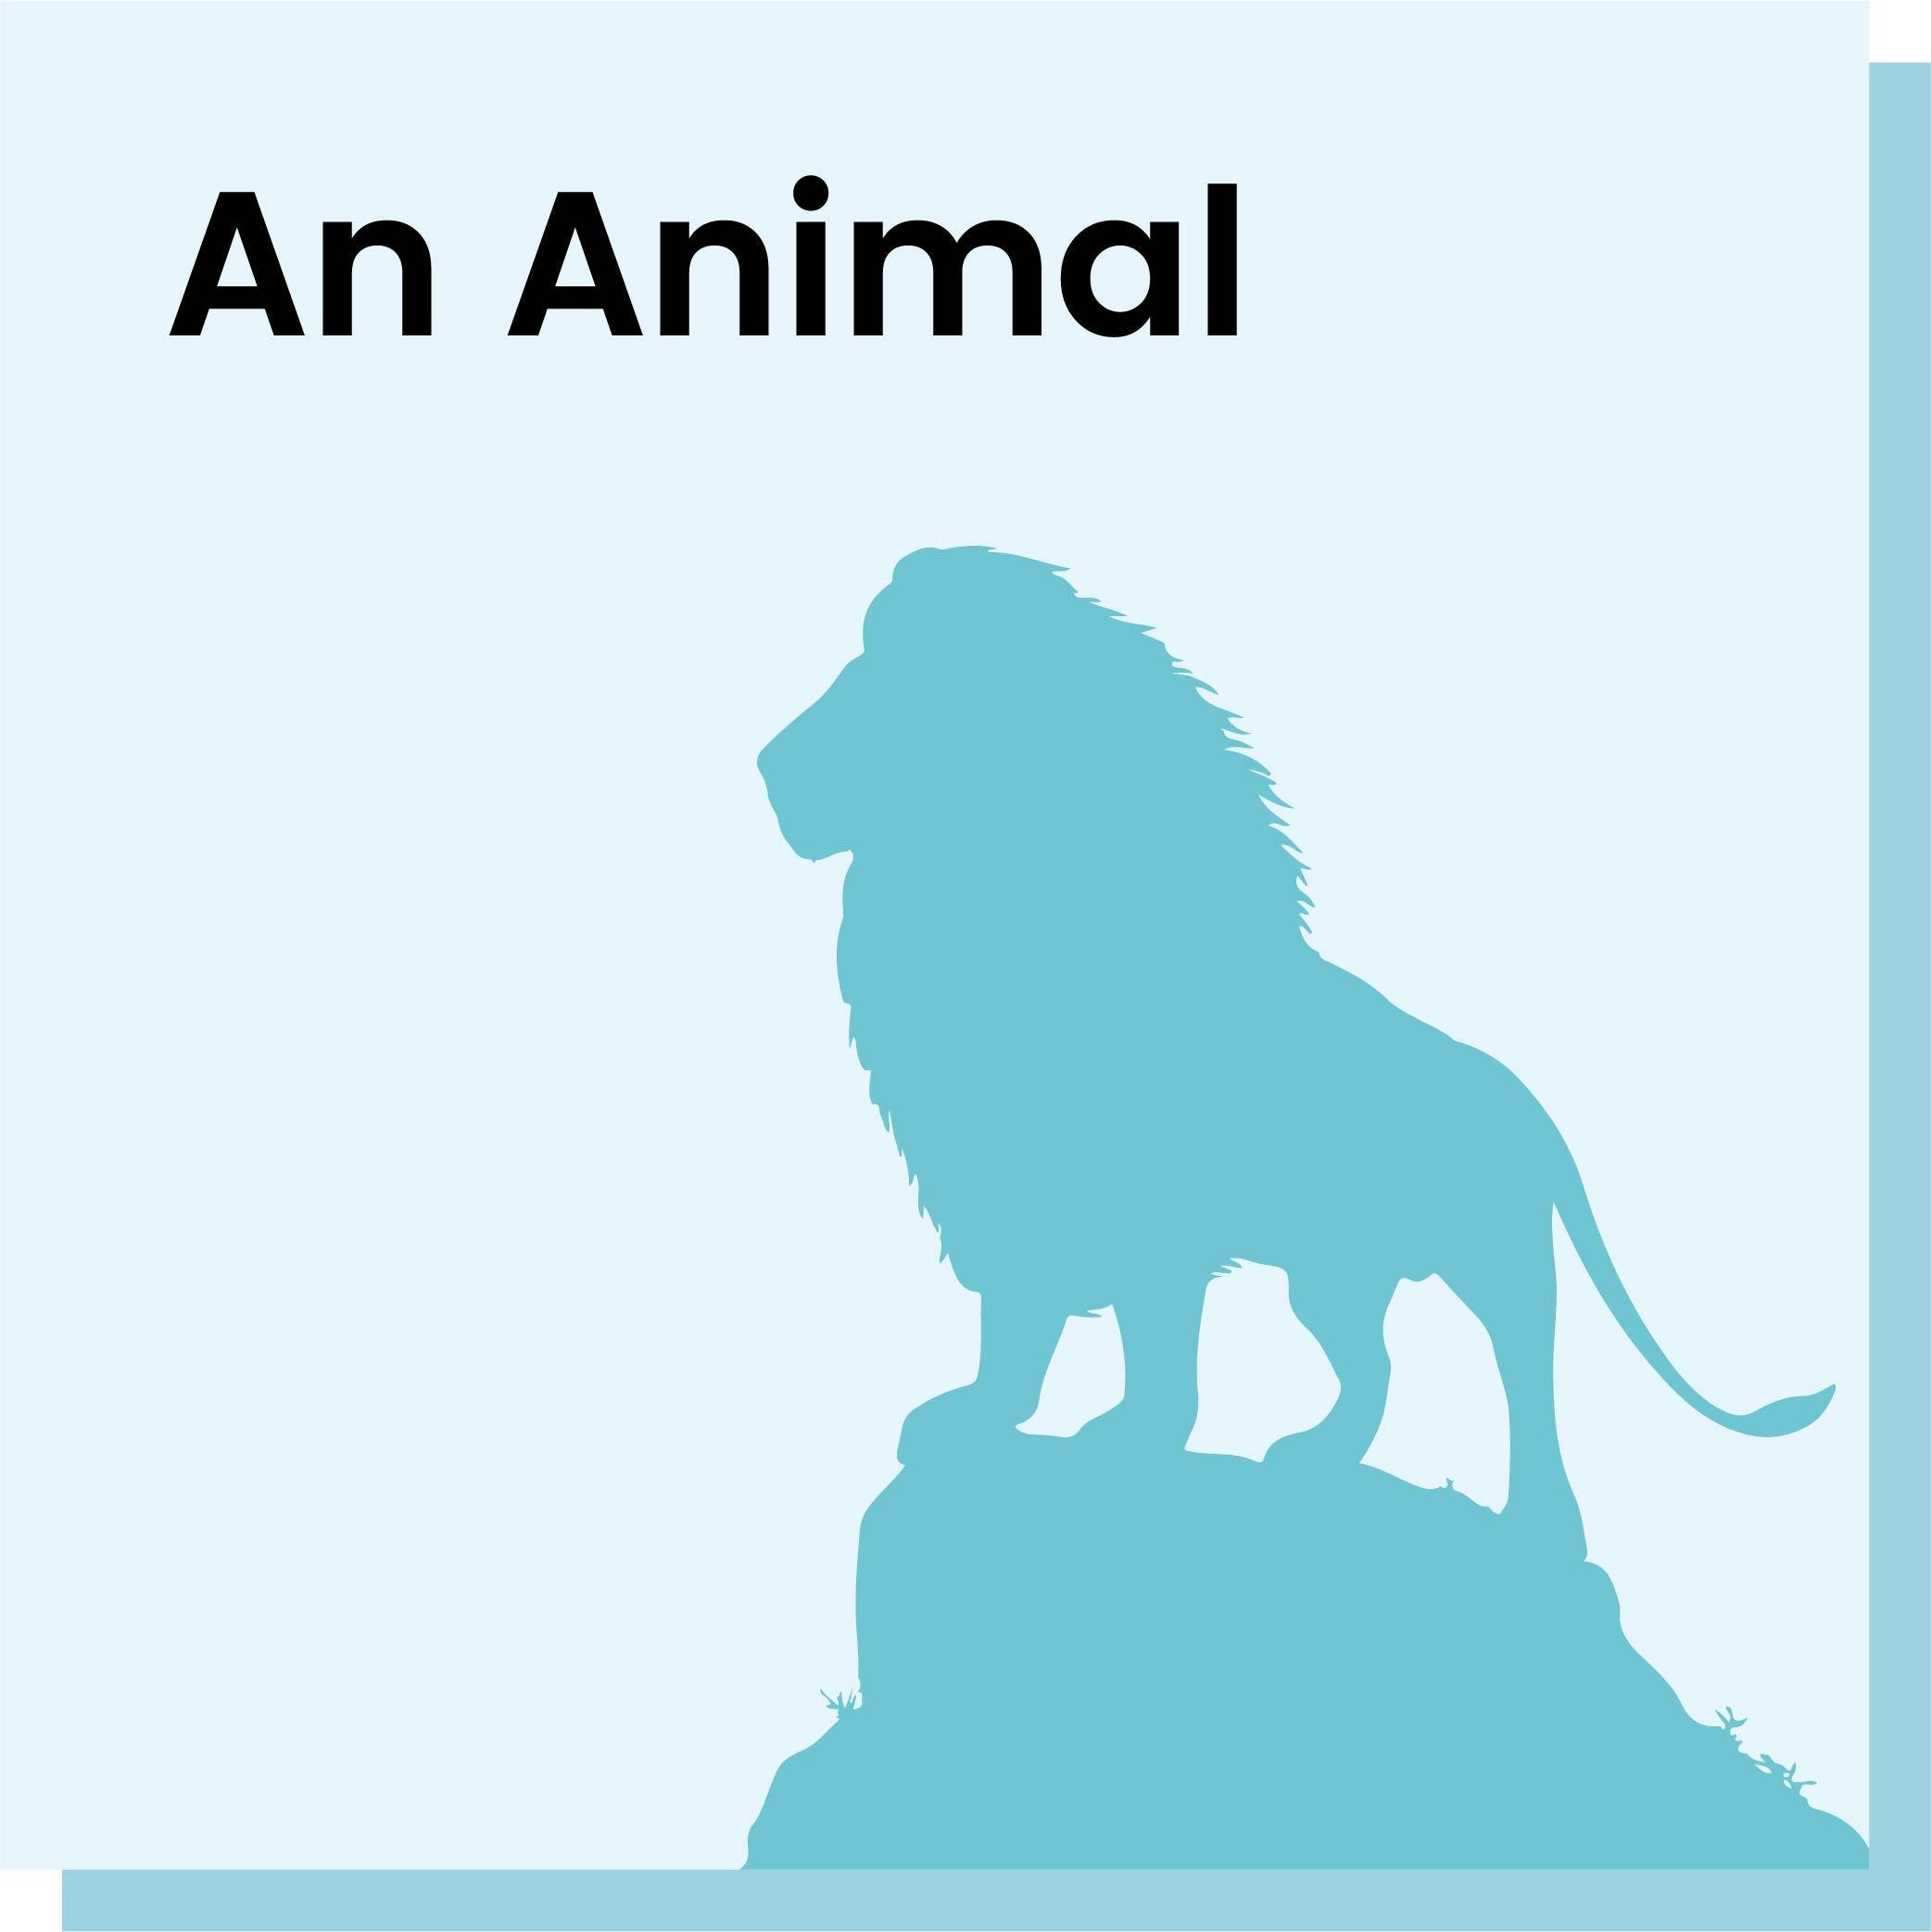 An Animal